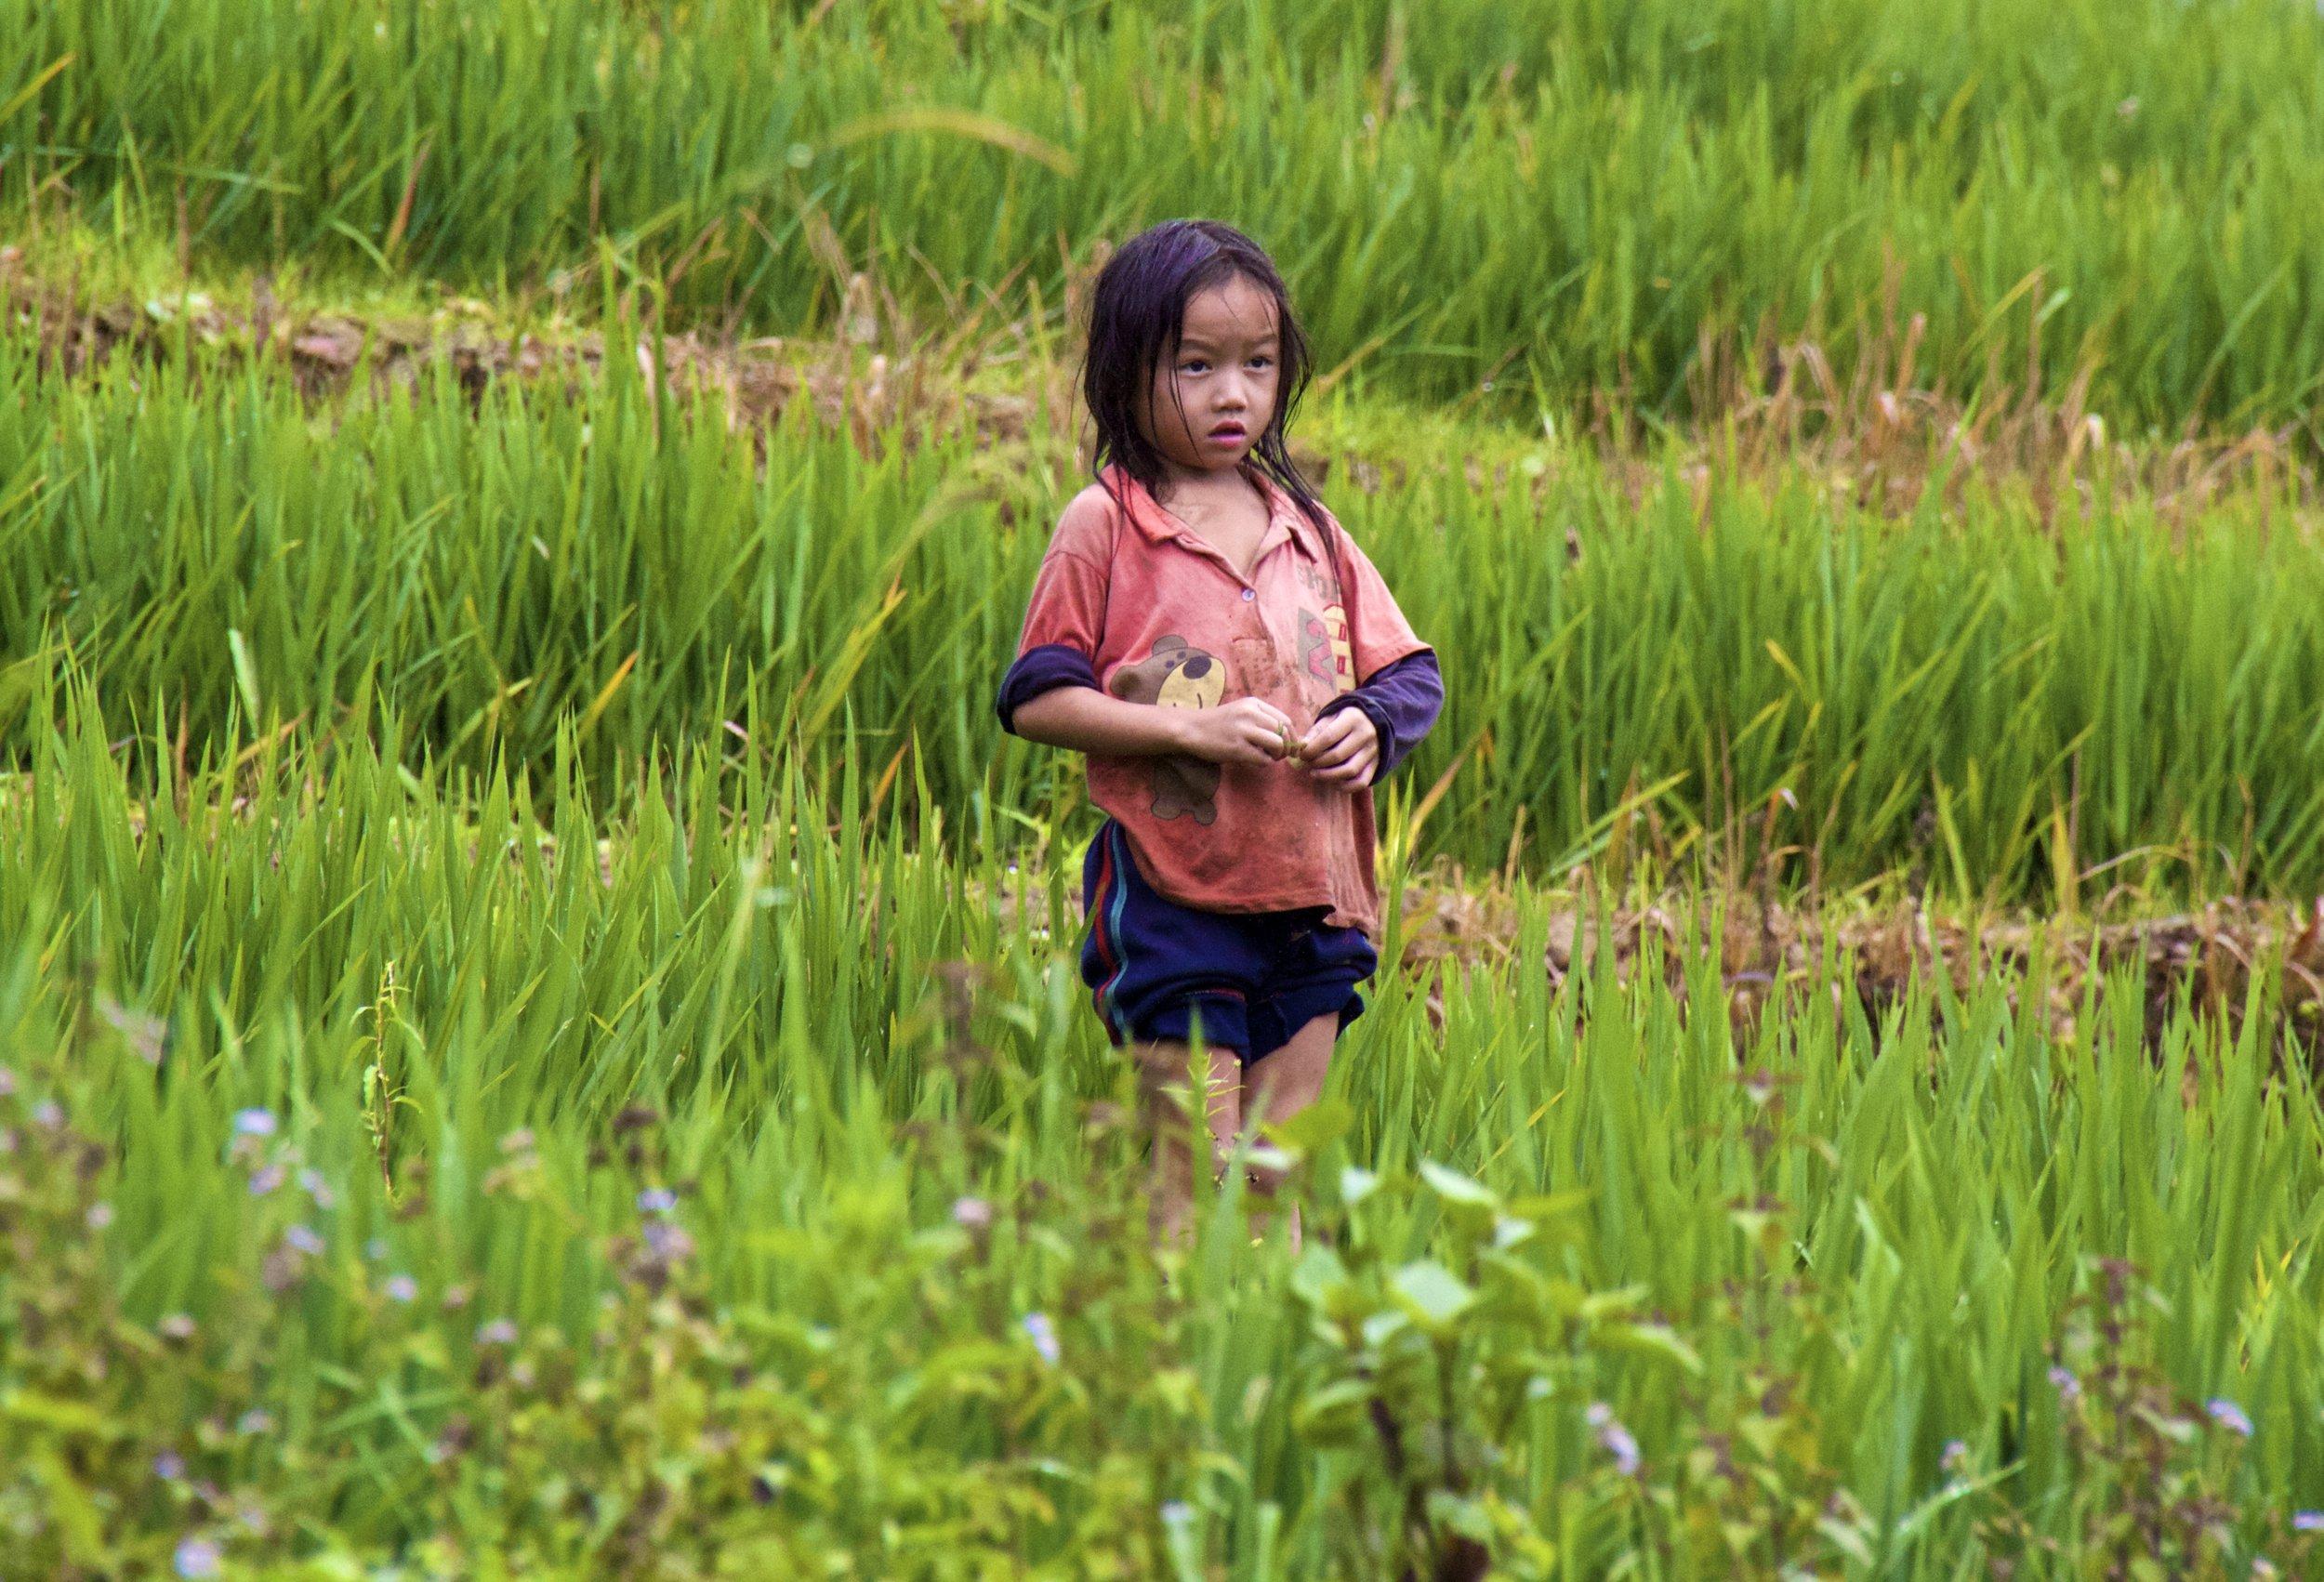 sa pa hmong people rice paddies 1.jpg